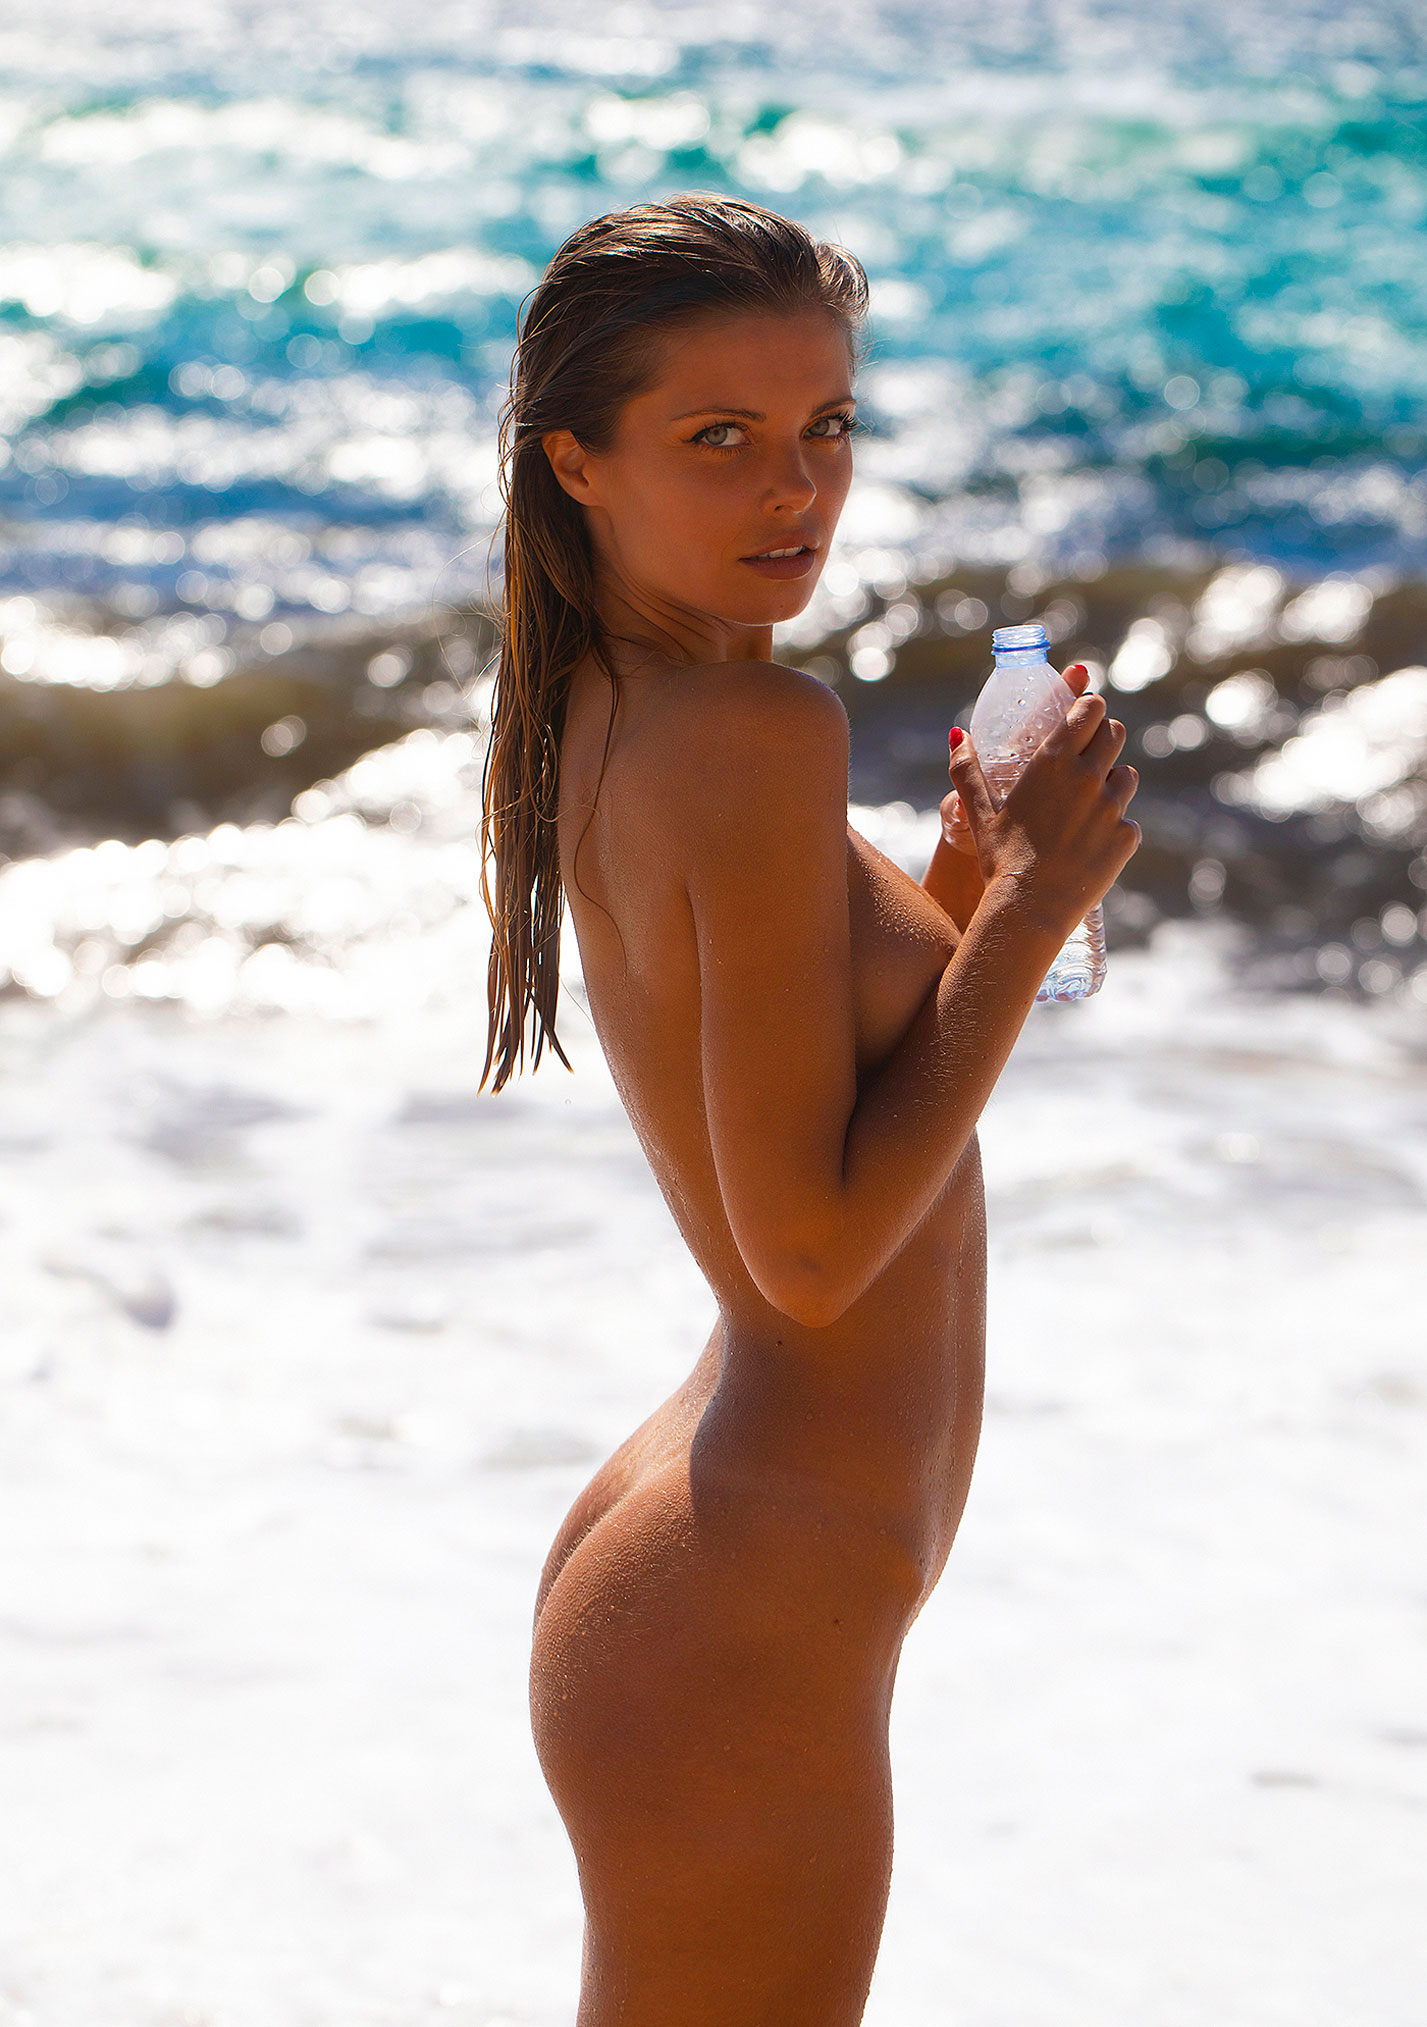 Девушка месяца Алина Бойко, Playboy Нидерланды август 2020 / фото 24